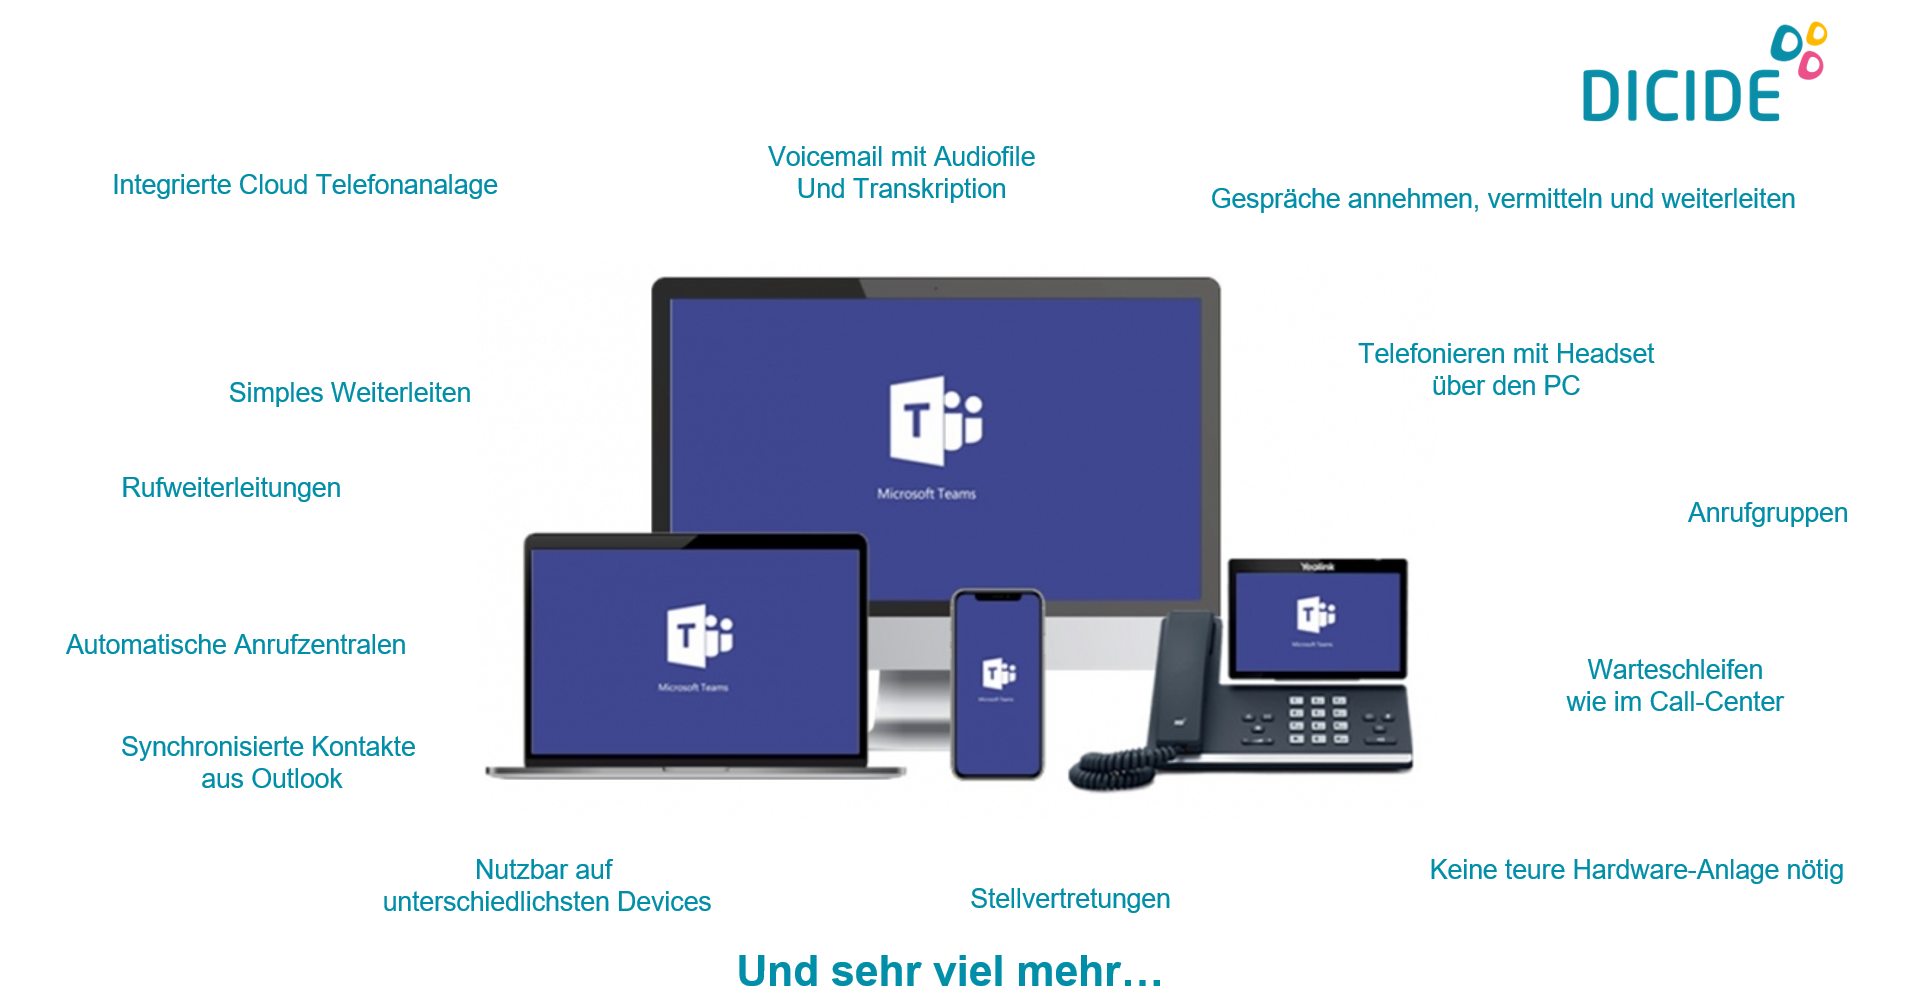 Microsoft Teams Als Telefonanlage nutzen